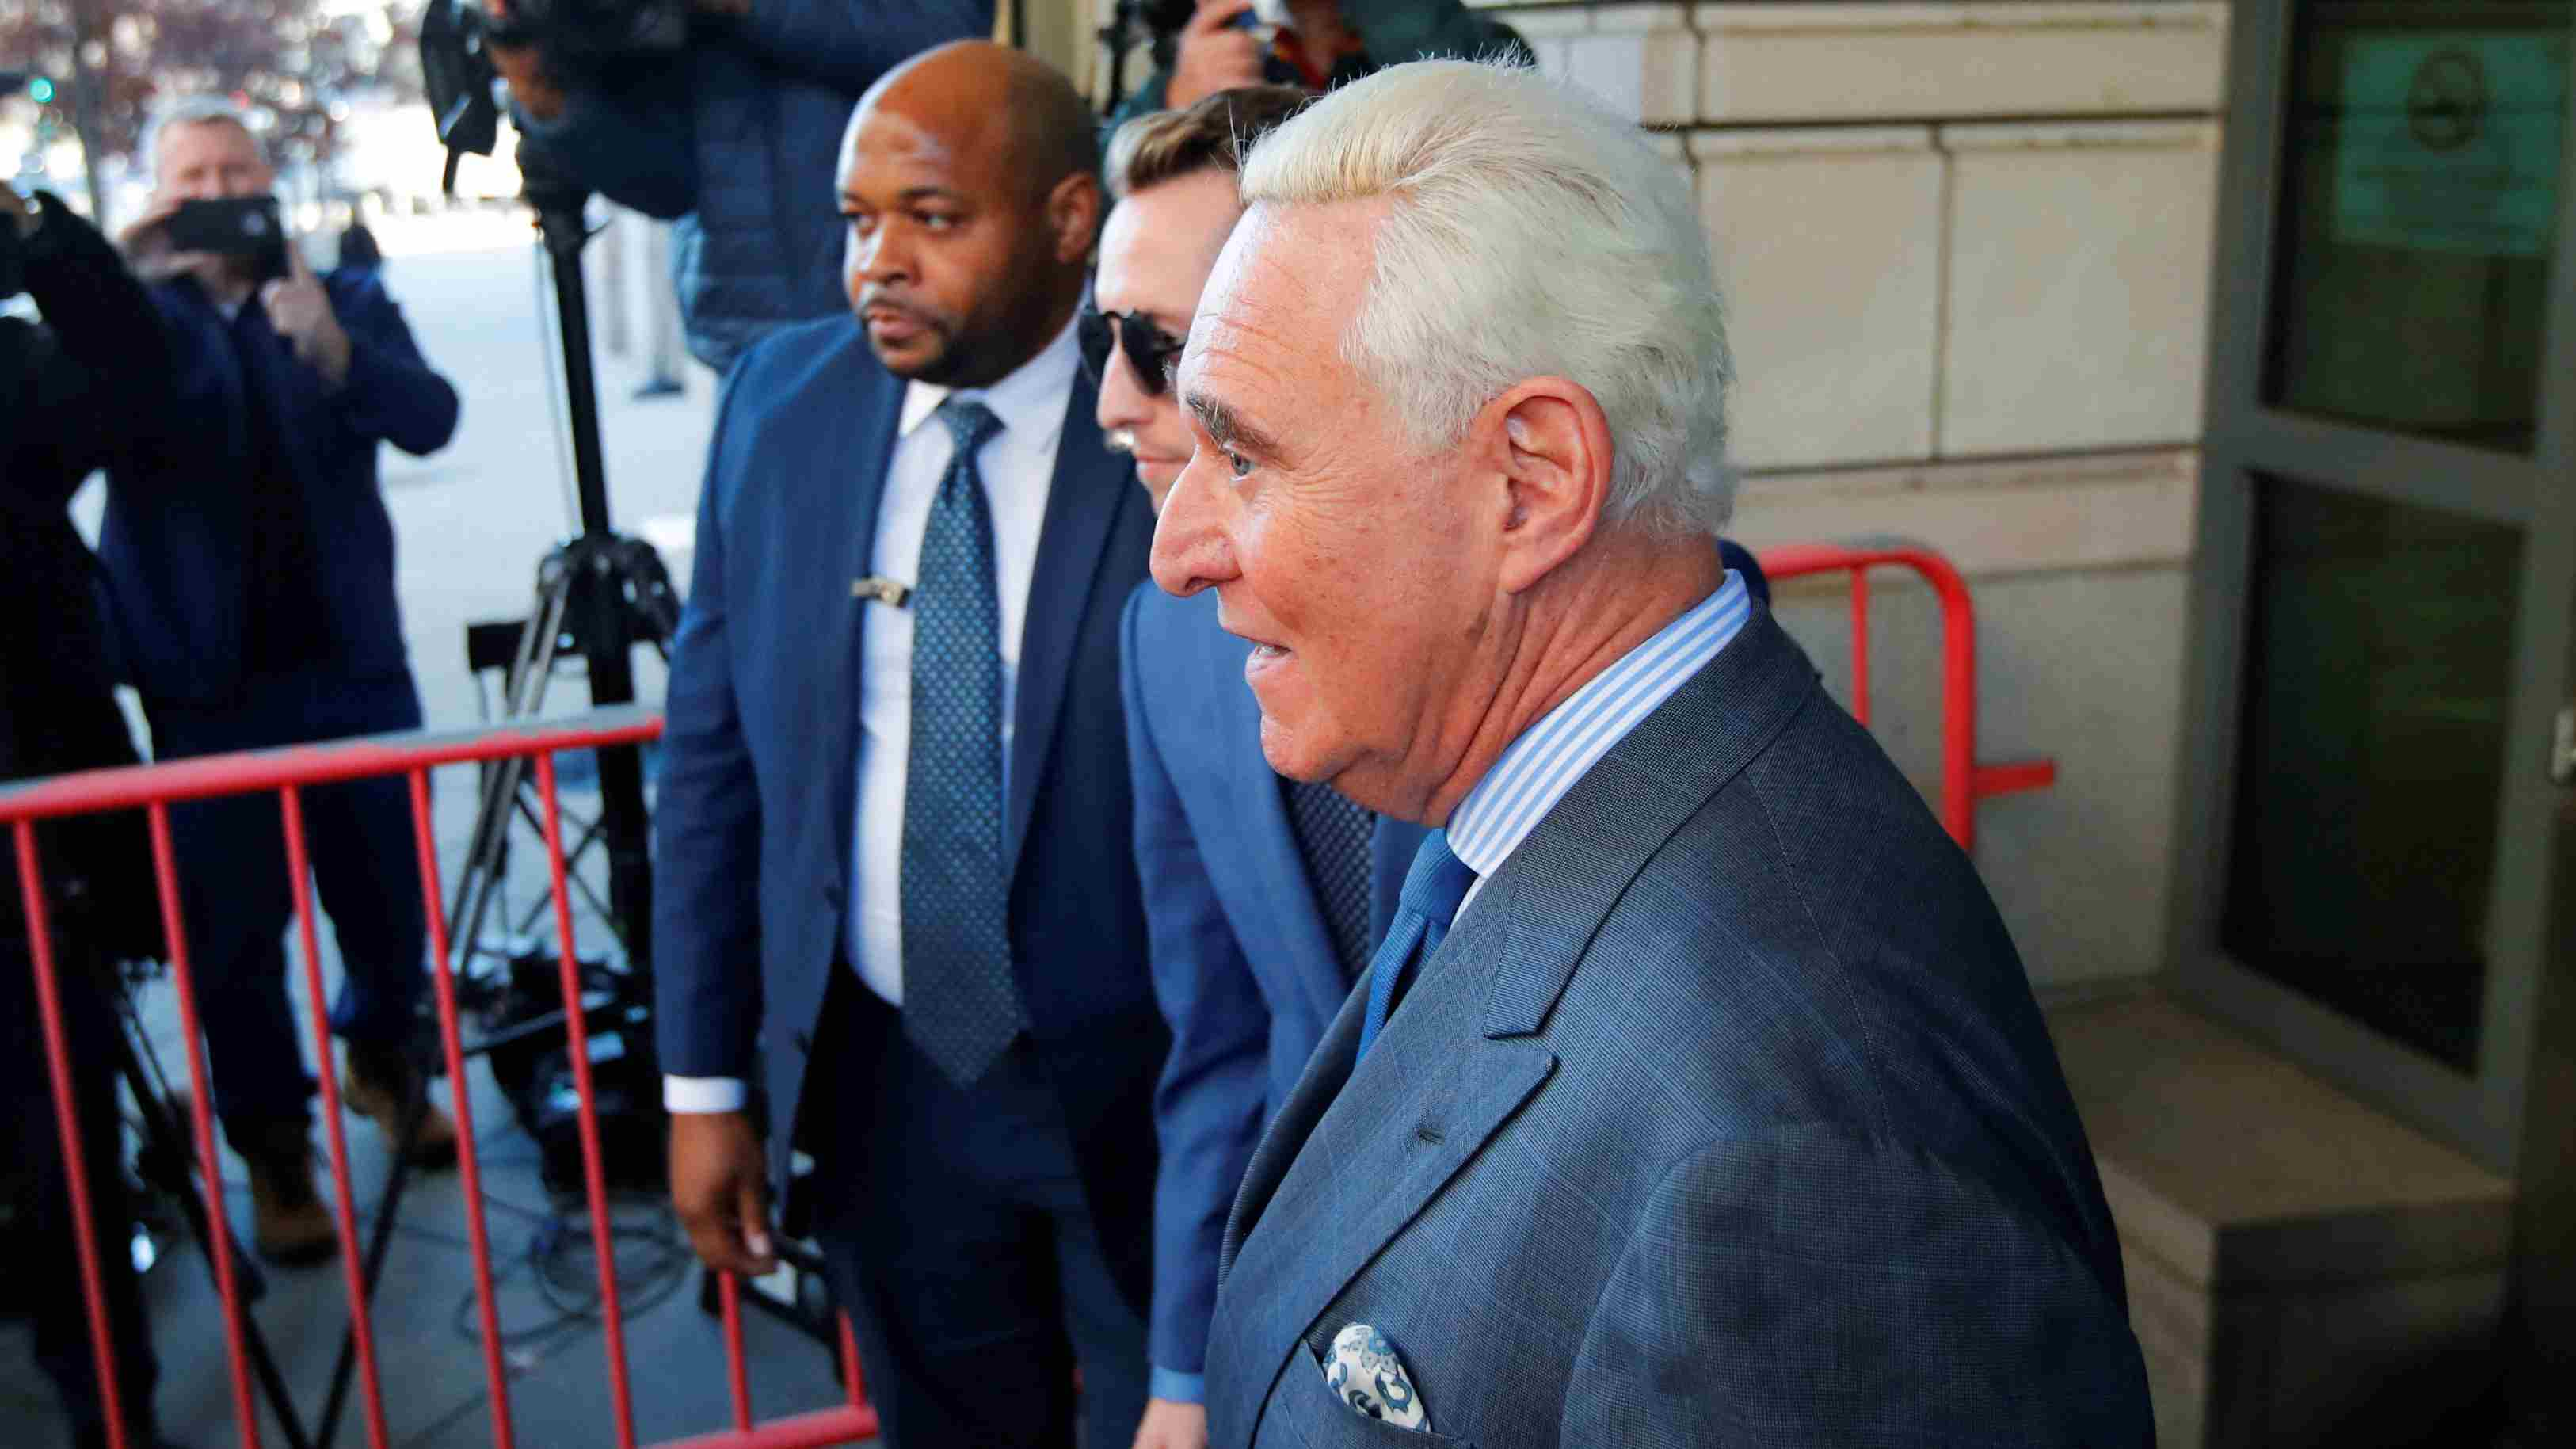 Facing stiff sentence, Trump advisor Stone seeks new trial